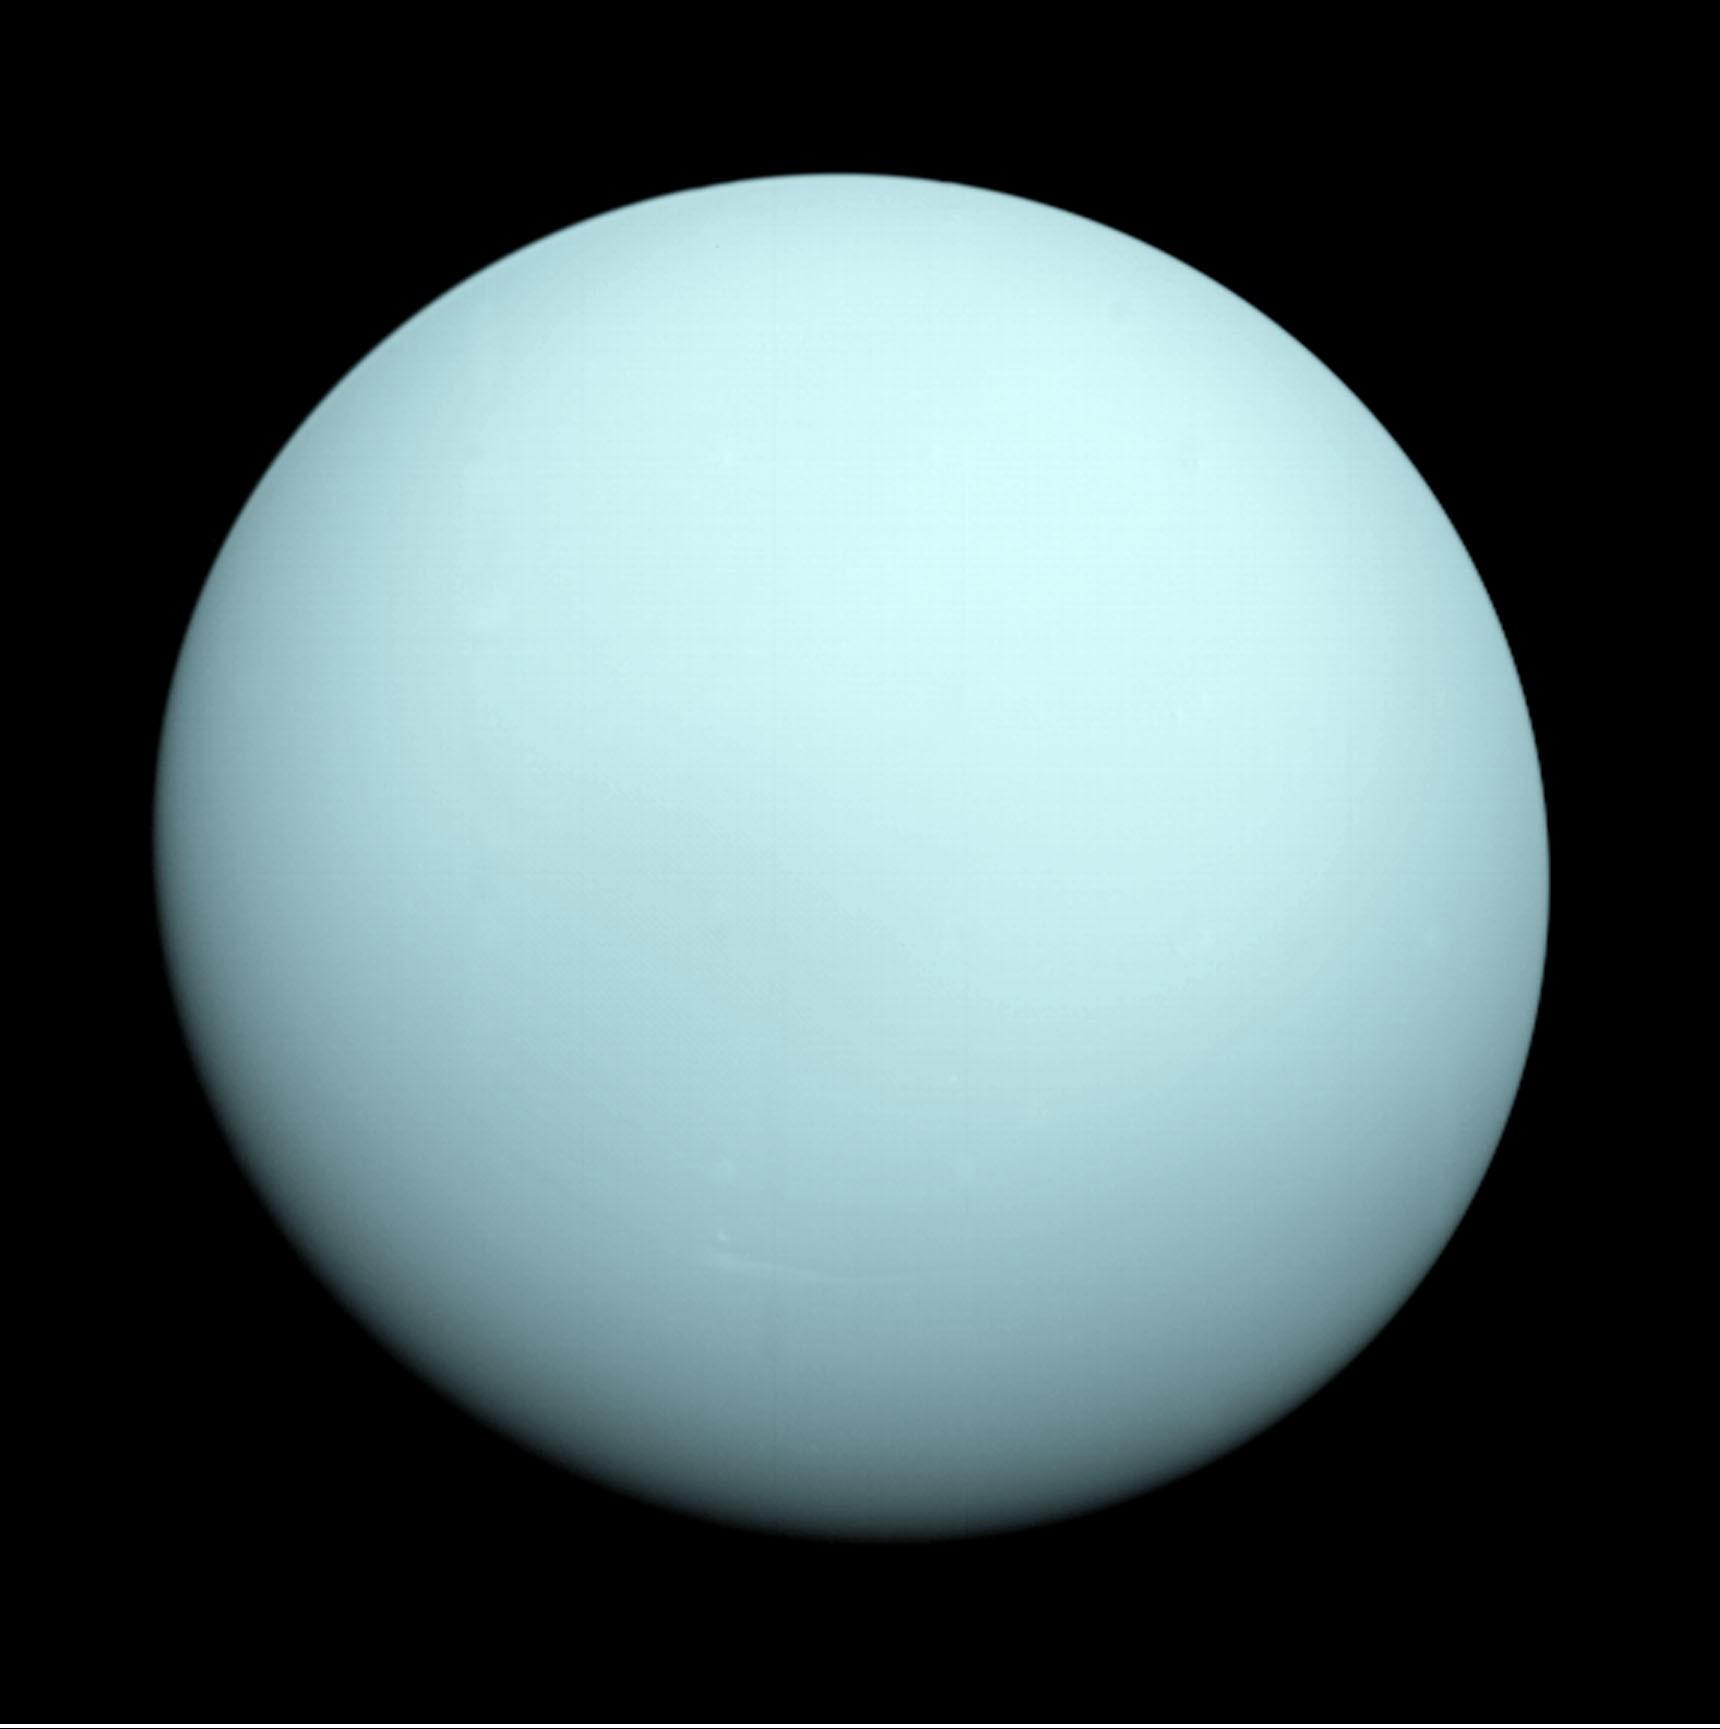 uranus moon cressida - photo #23